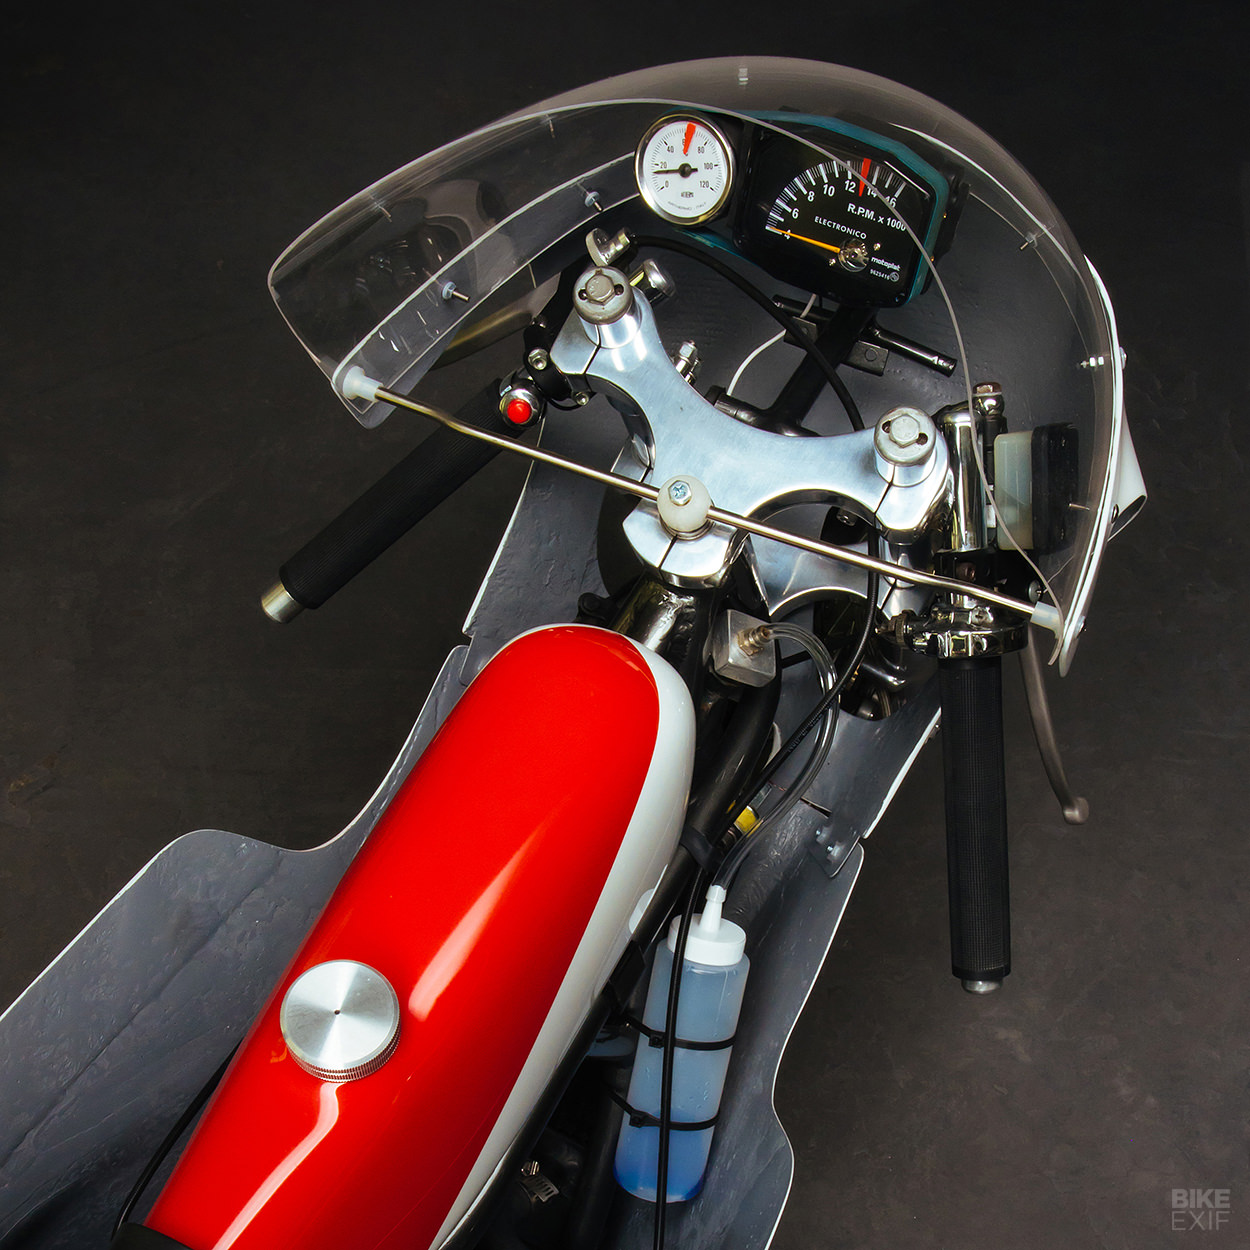 1975 Minarelli 50 GP racing motorcycle